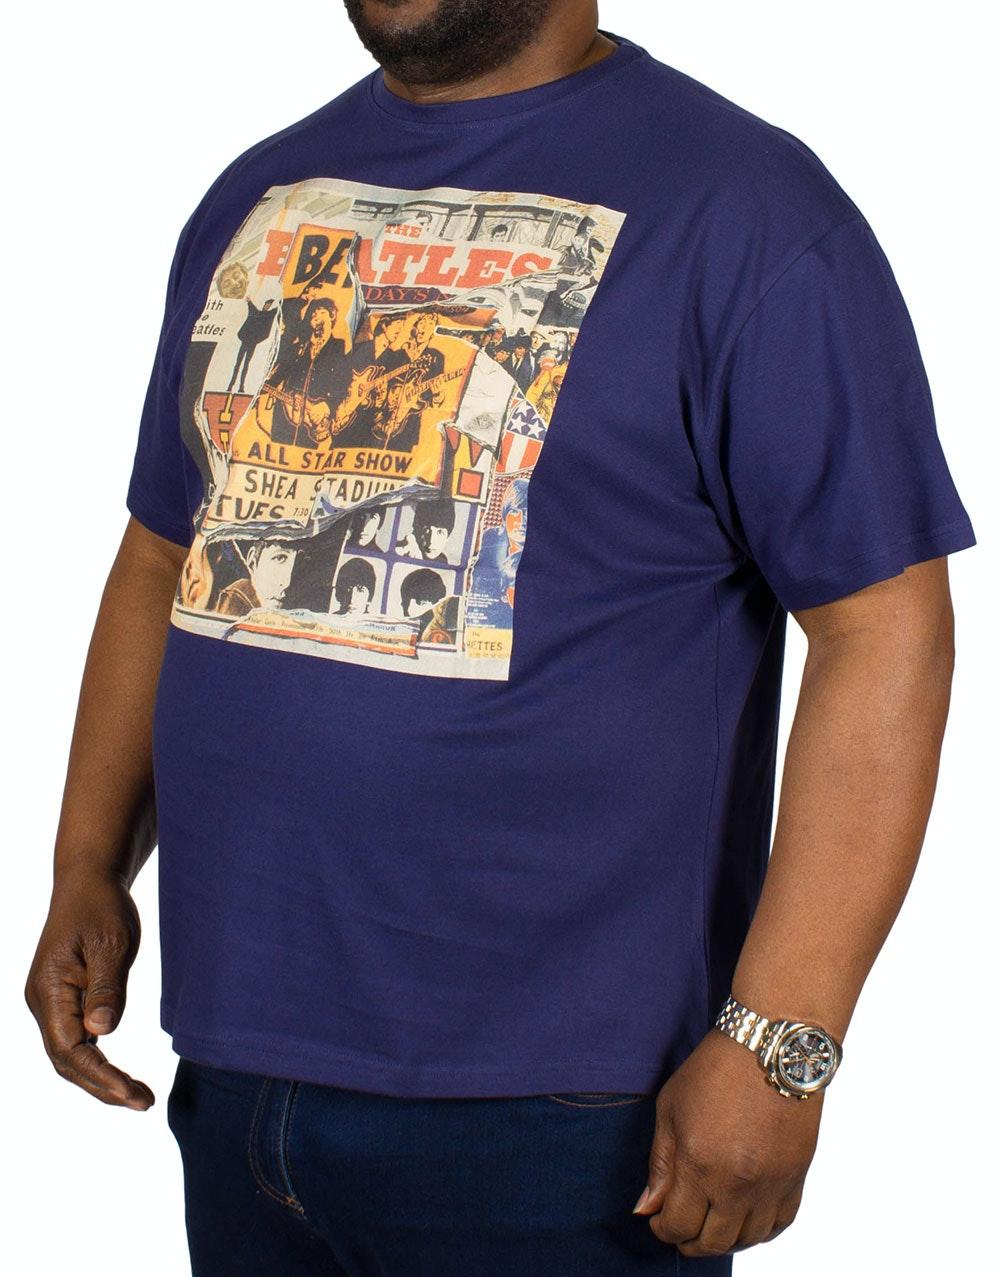 Replika Beatles Print T-Shirt